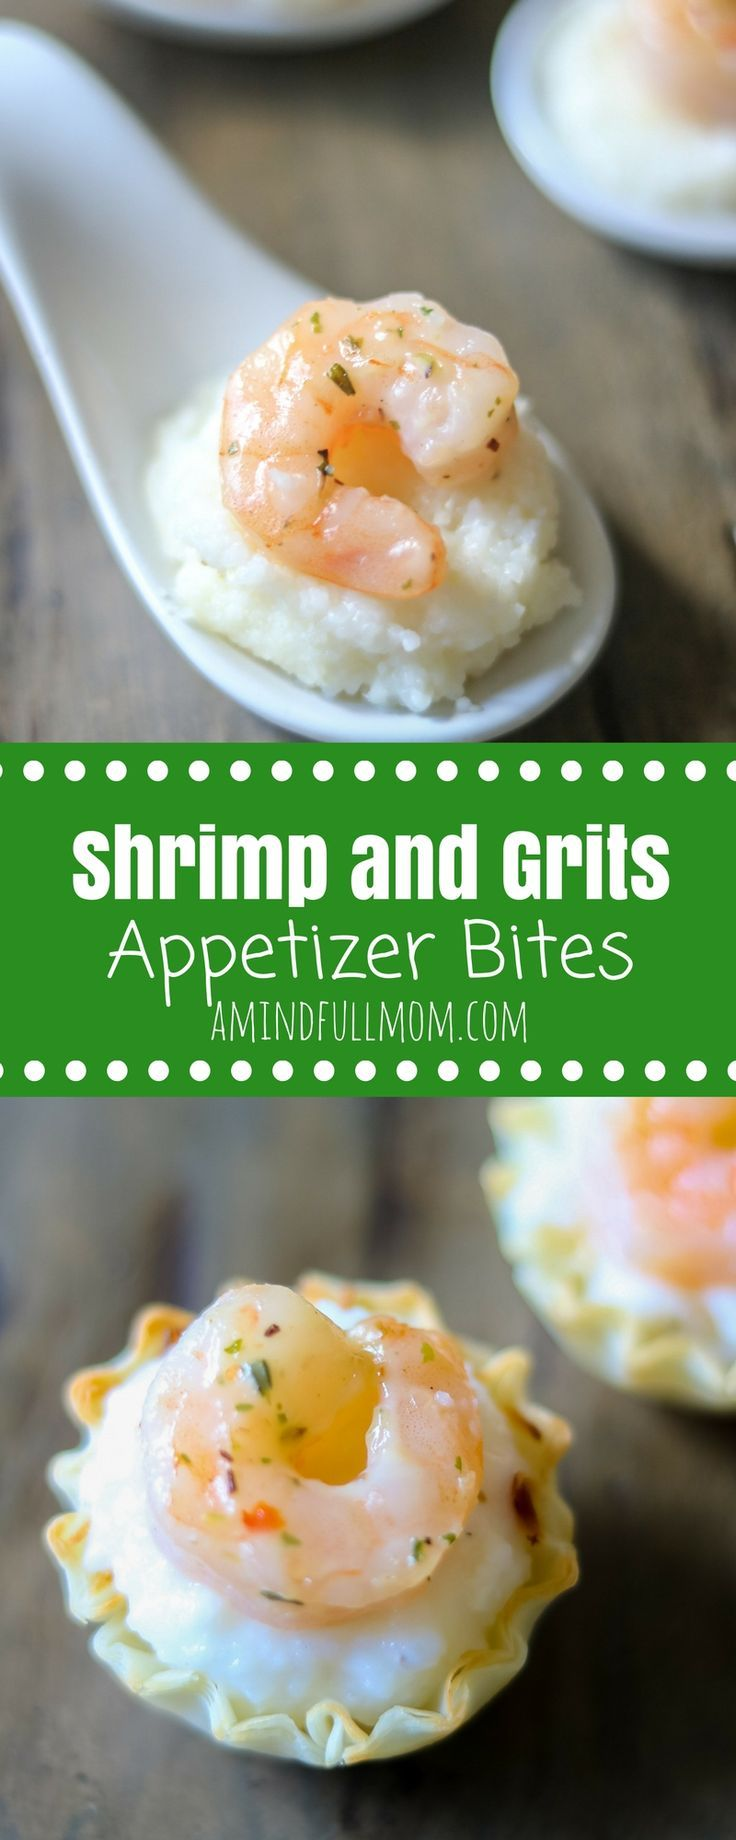 Mini Shrimp and Grits Appetizer Bites: These quick and easy shrimp and grits appetizer recipe will wow your party guests!#appetizer #shrimp #holidayentertaining #easyrecipe #shrimpandgrits #easyappetizer #handheldappetizer AD @GortonsSeafood via @amindfullmom